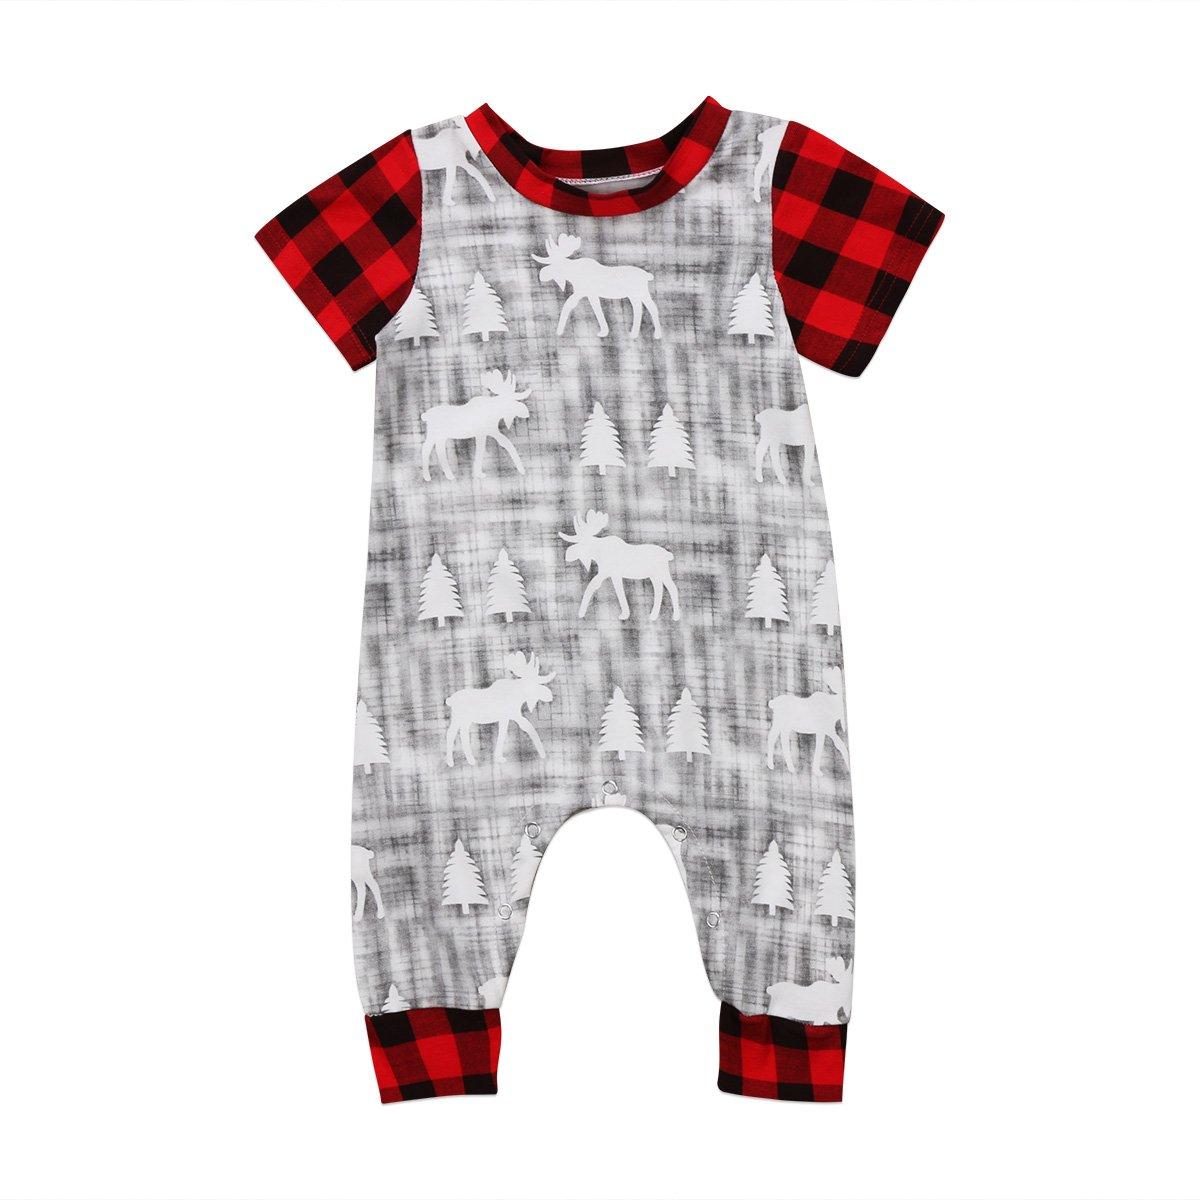 Infant Baby Boy Girl Short Sleeve Romper Plaid Deer Pattern Bodysuit Jumpsuit Outfits